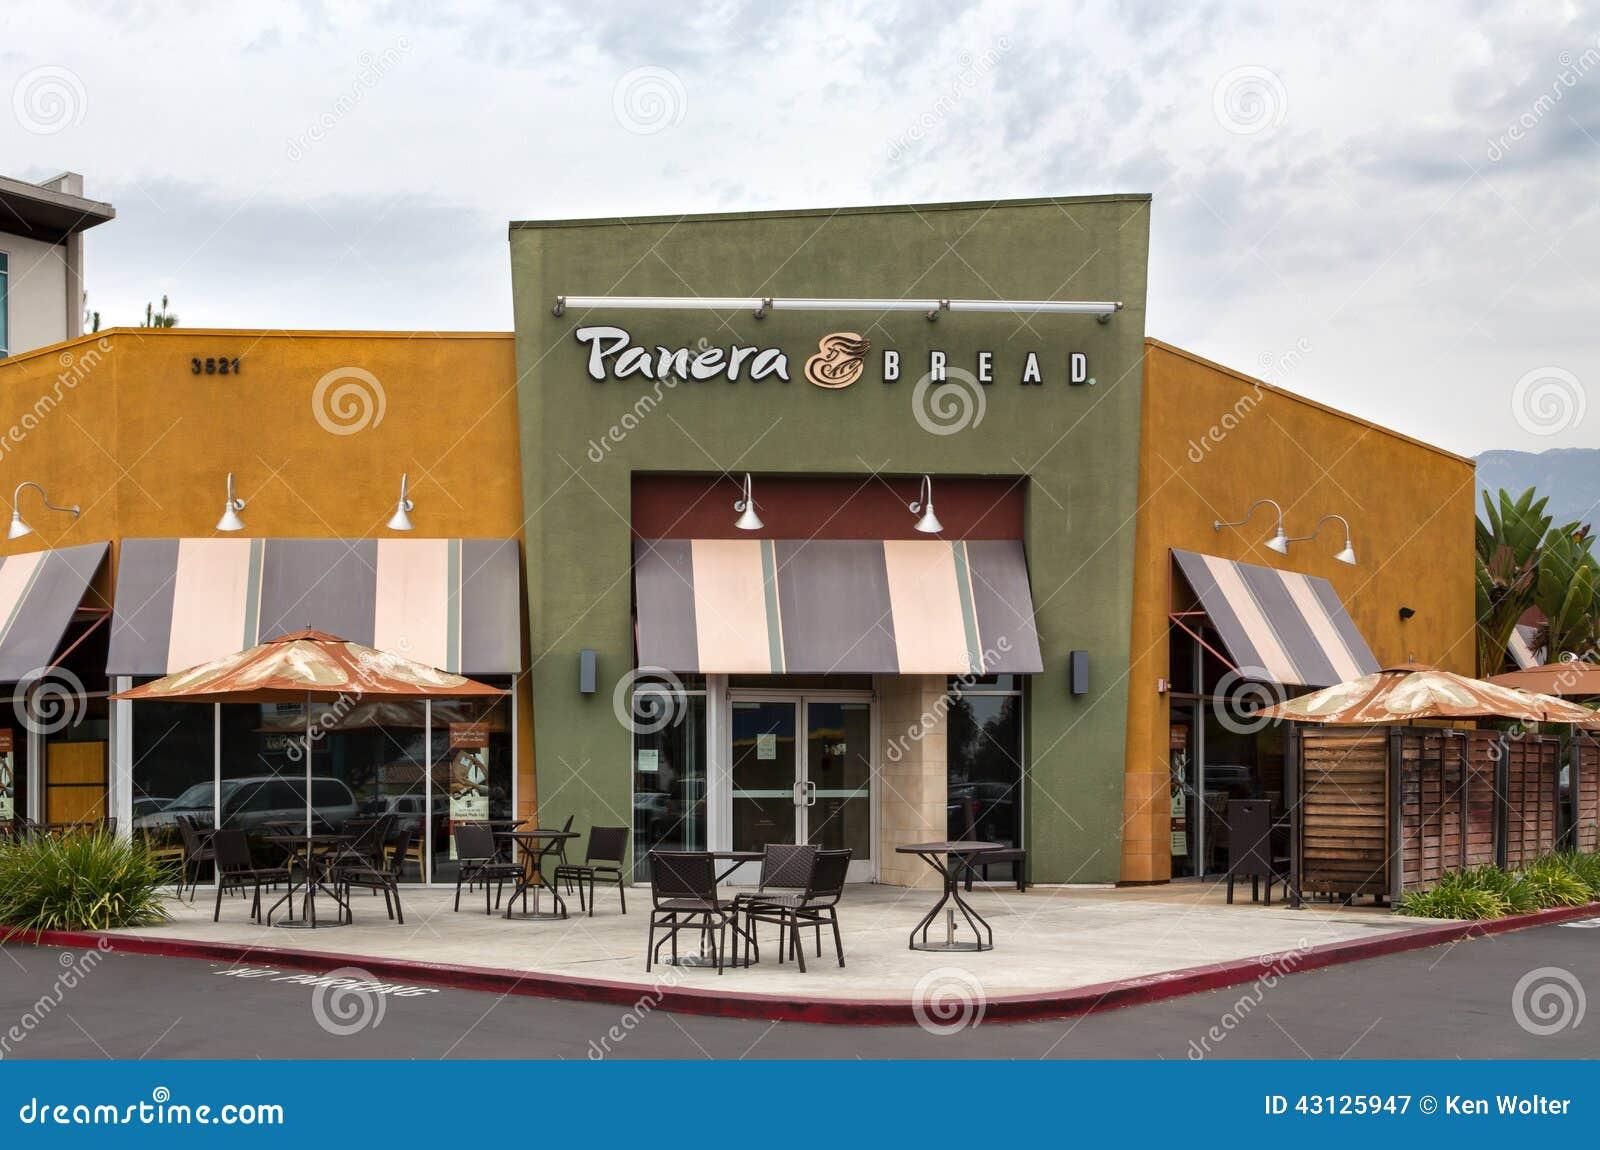 Panera bread restaurant exterior editorial photography for Restaurant exterior design ideas